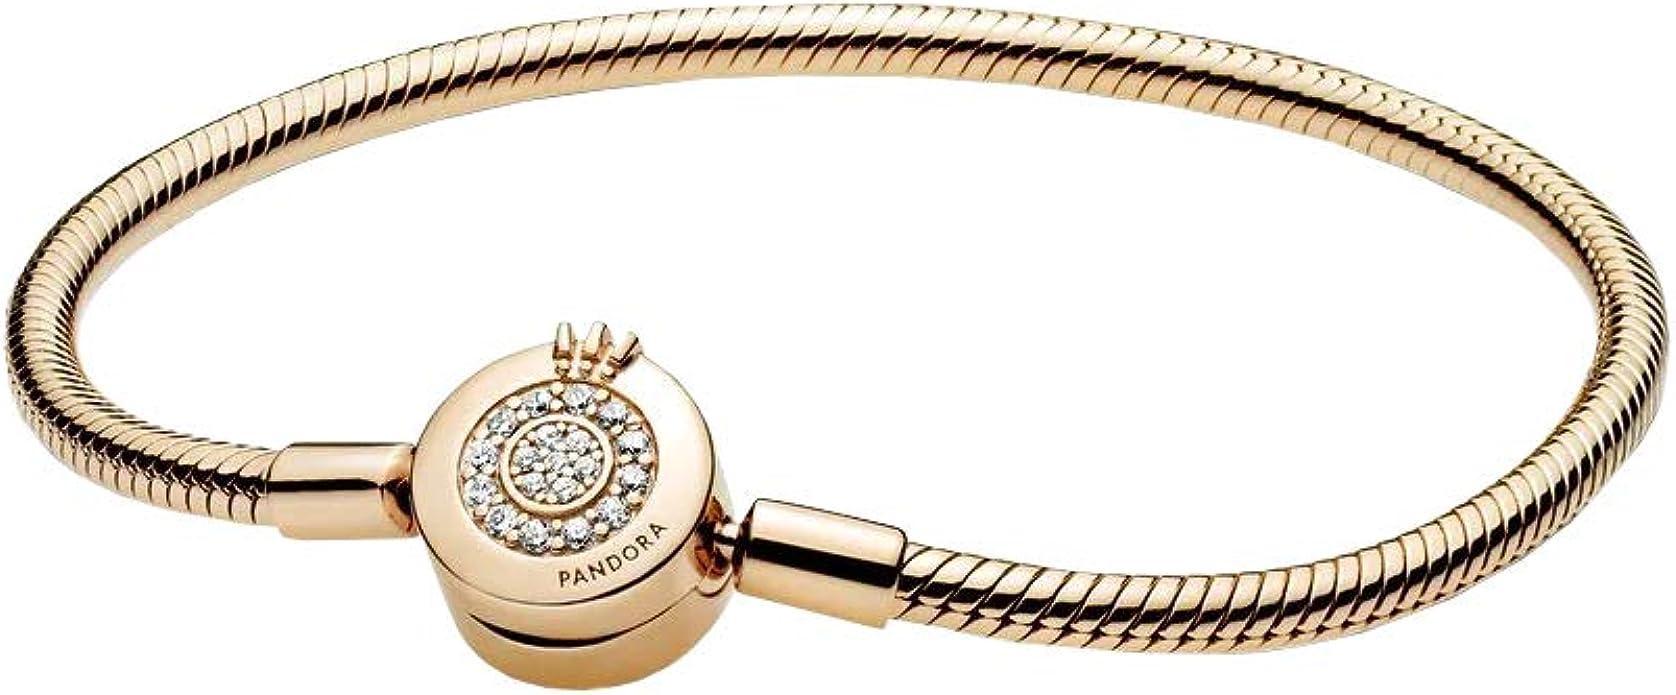 PANDORA Pandora Moments Sparkling Crown O Snake Chain Bracelet, Clear CZ  18k Gold Plated PANDORA Shine Collection Charm Bracelet